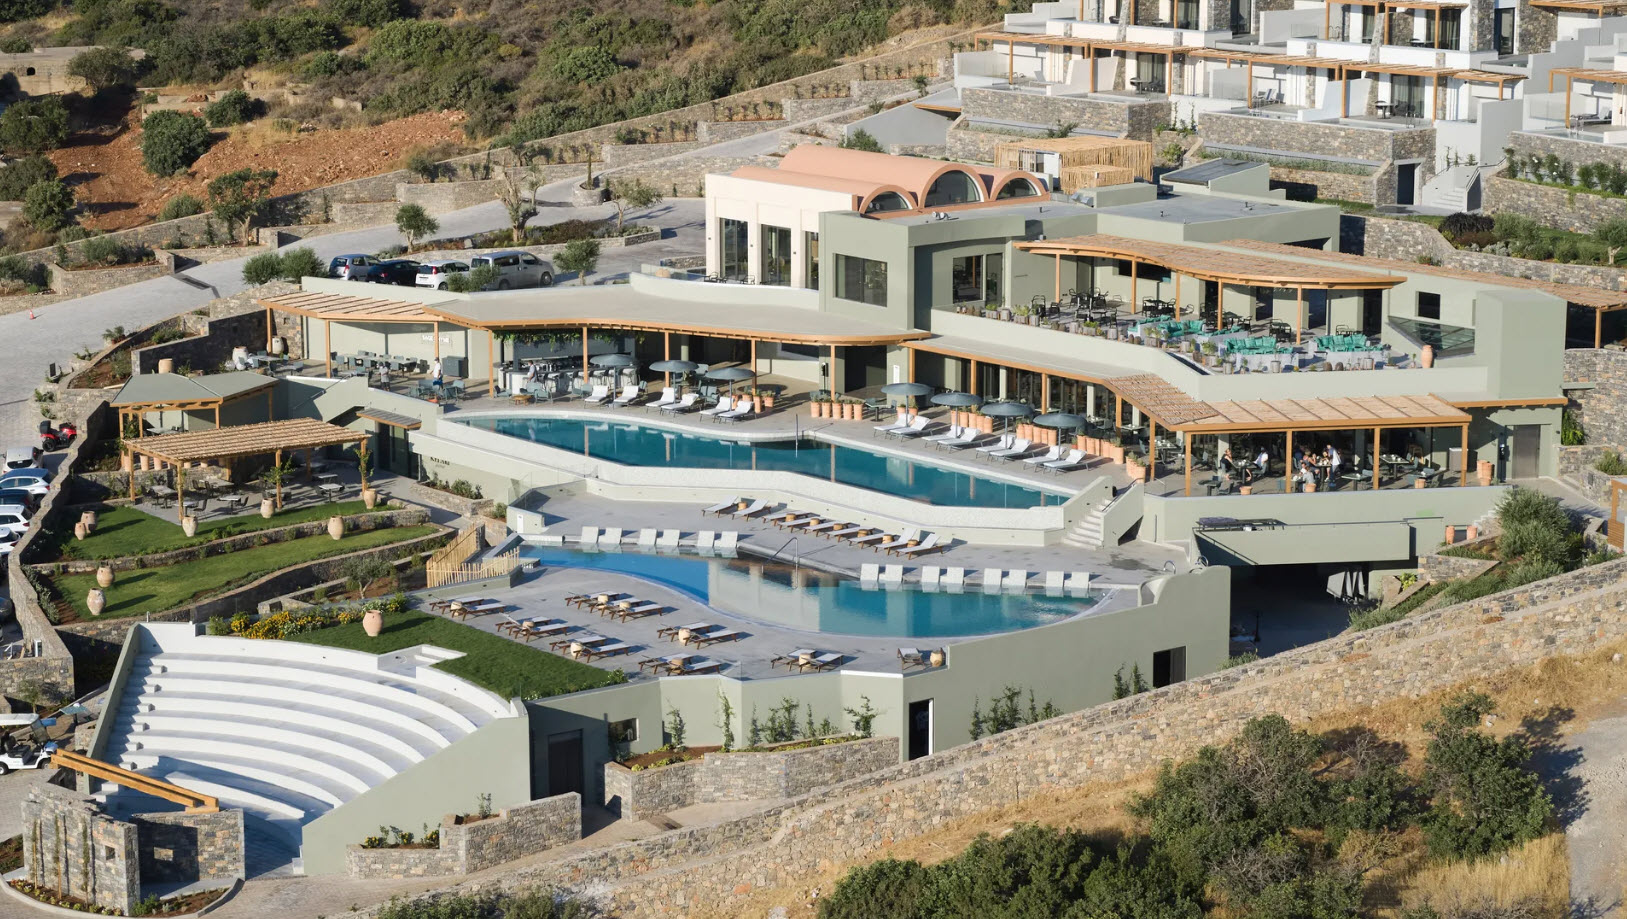 5* Cayo Exclusive Resort & Spa - Ελούντα, Κρήτη ✦ 2 Ημέρες (1 Διανυκτέρευση) ✦ 2 άτομα ✦ Πρωινό ✦ 01/09/2021 έως 30/09/2021 ✦ Κοντά σε παραλία!